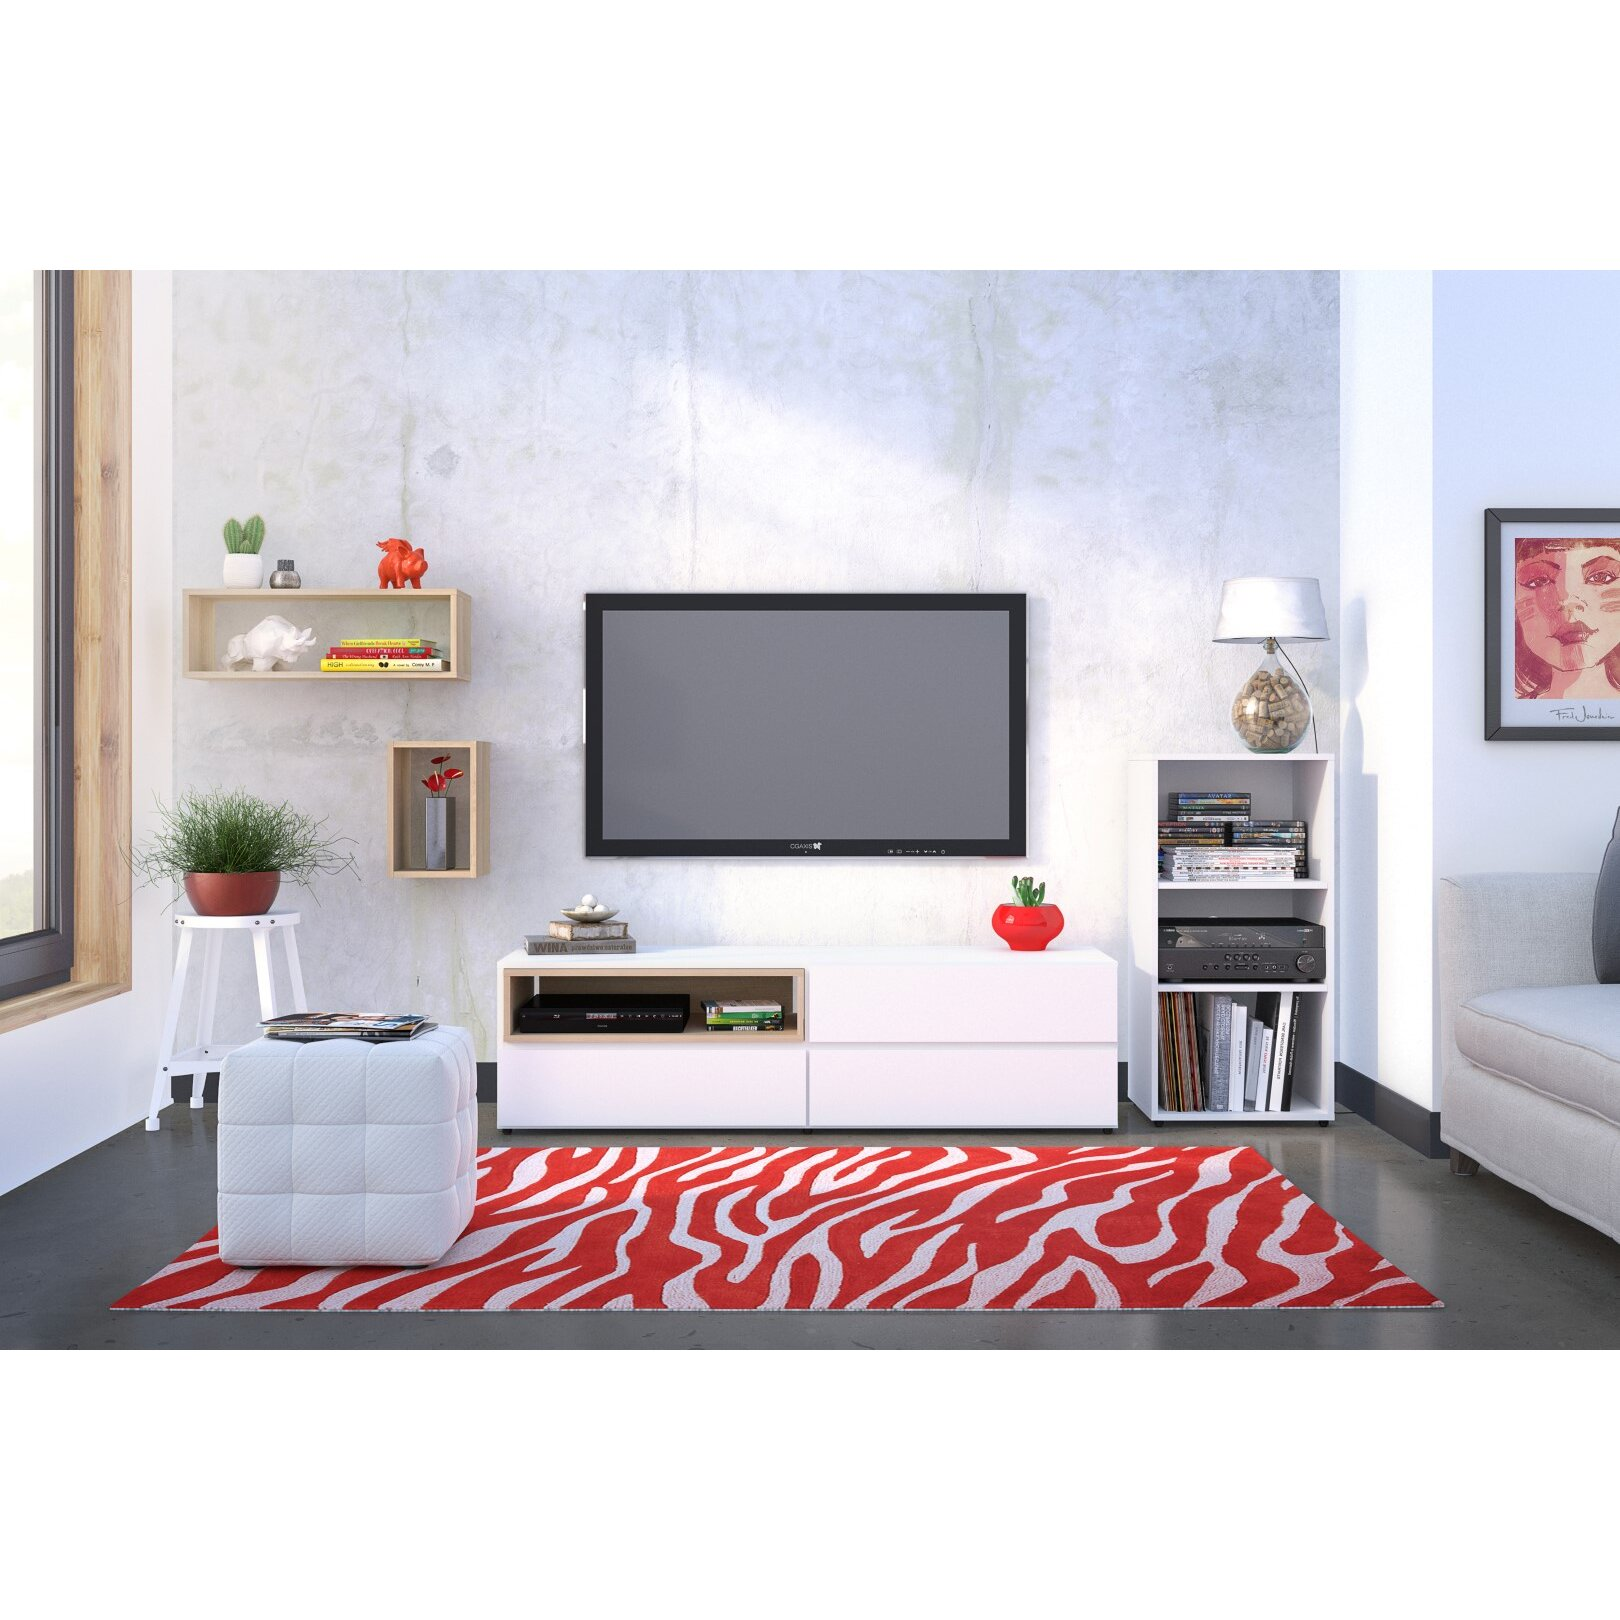 Zipcode design chelsey living room set reviews for Wg r living room sets